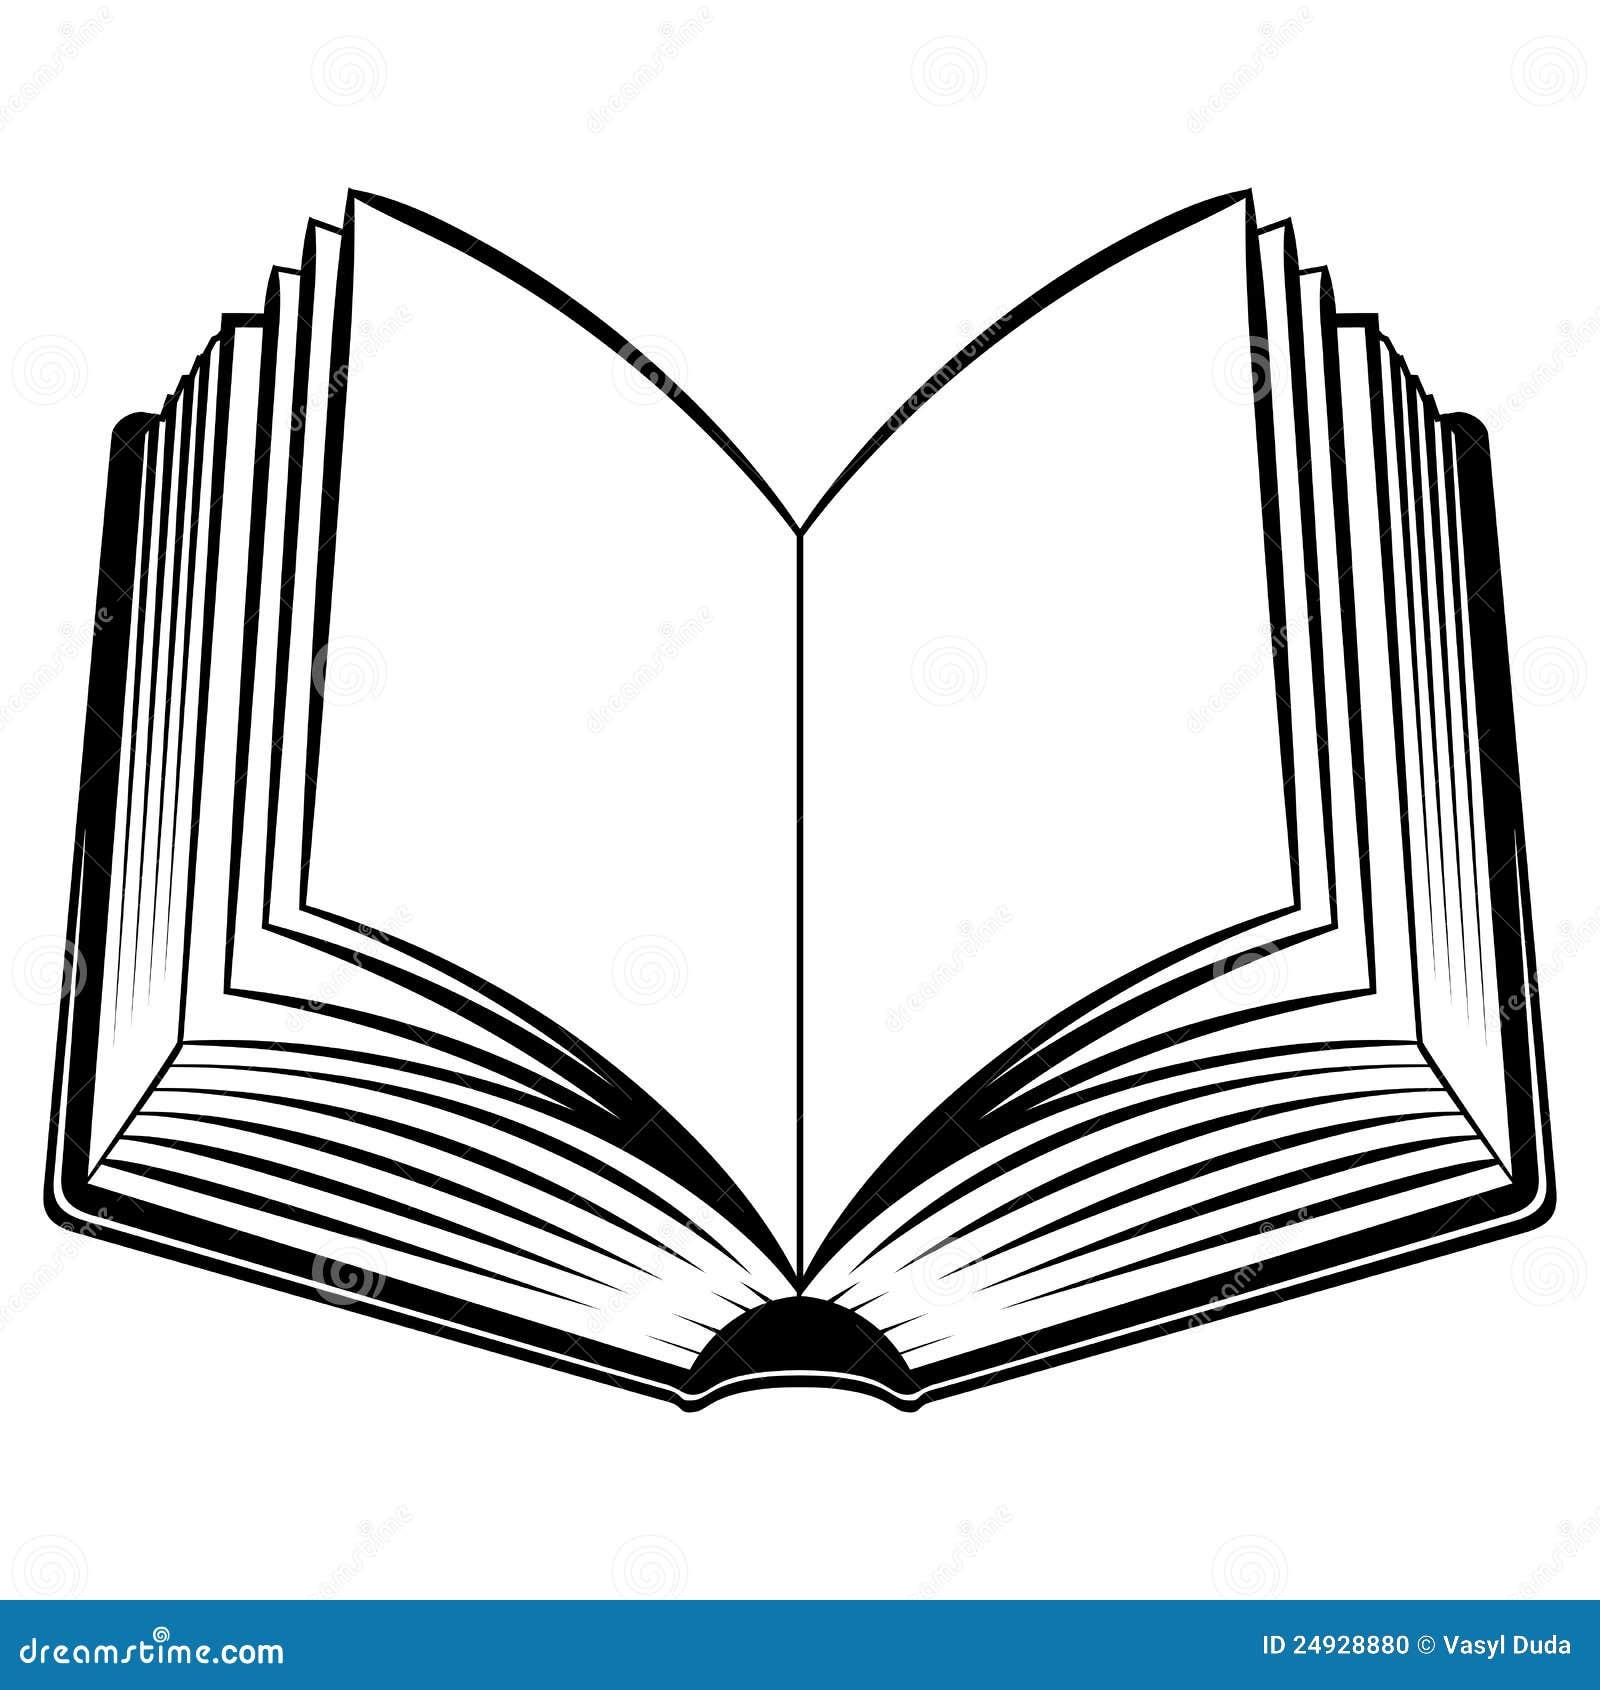 Open Book. Black and white illustration for design.